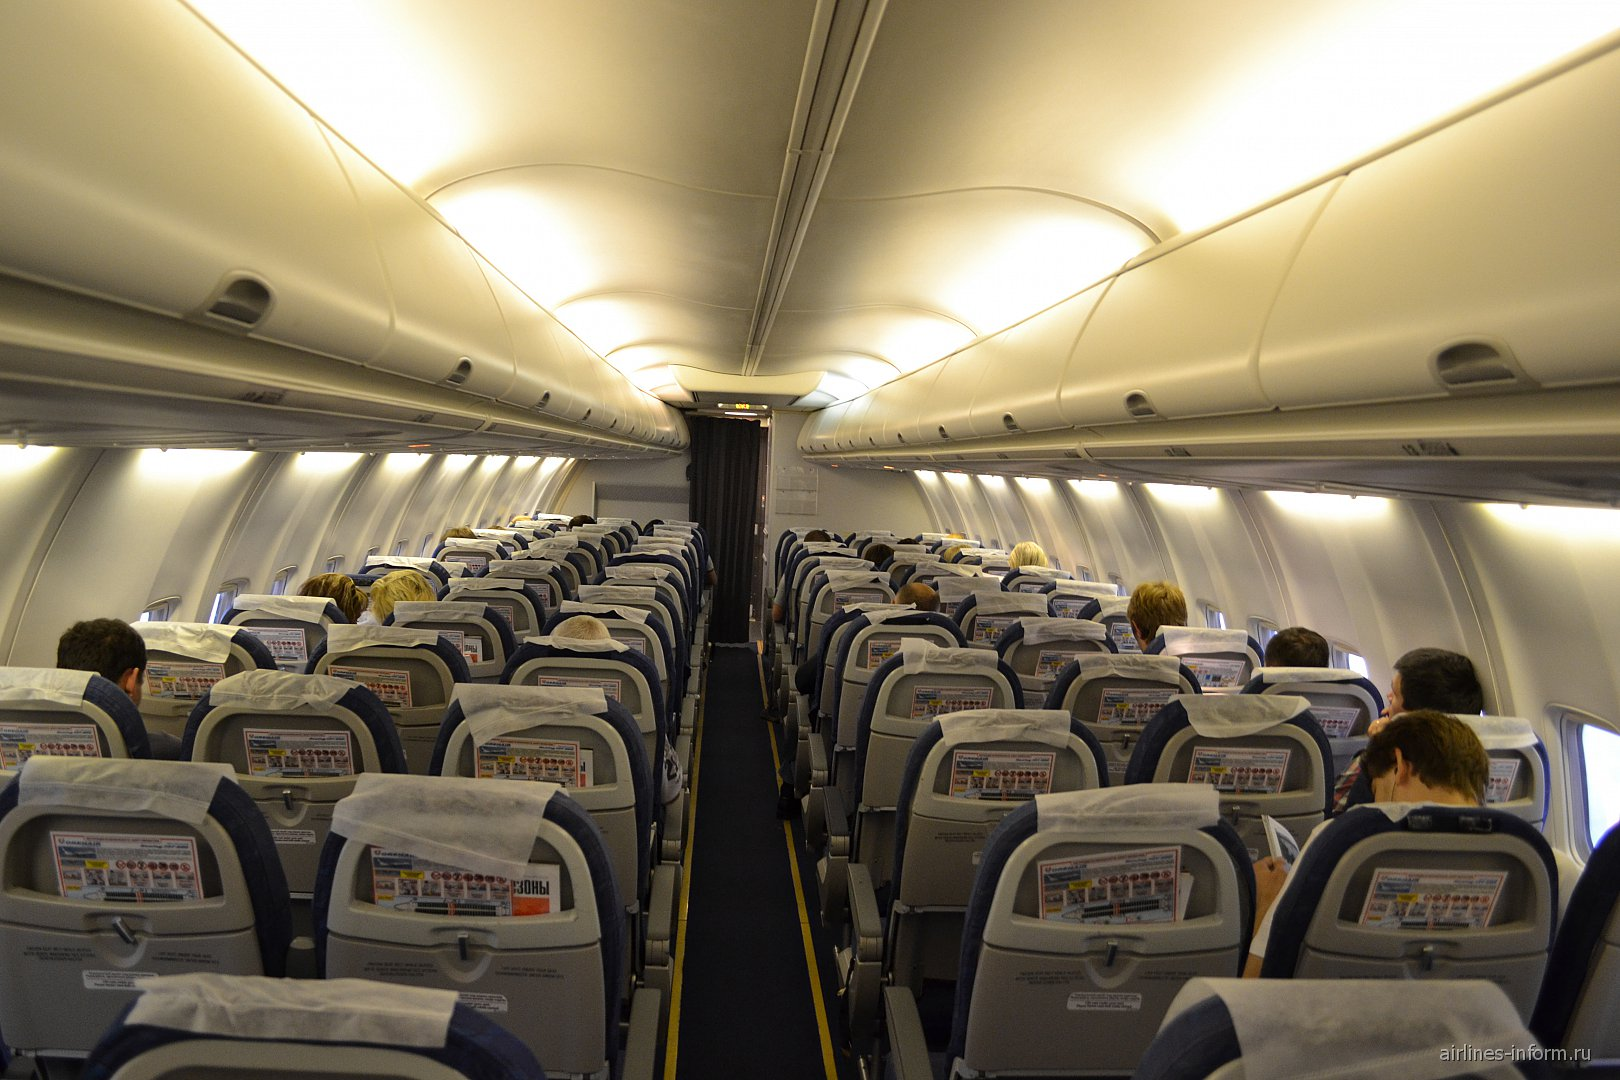 Салон самолета Боинг-737-800 Оренбургских авиалиний